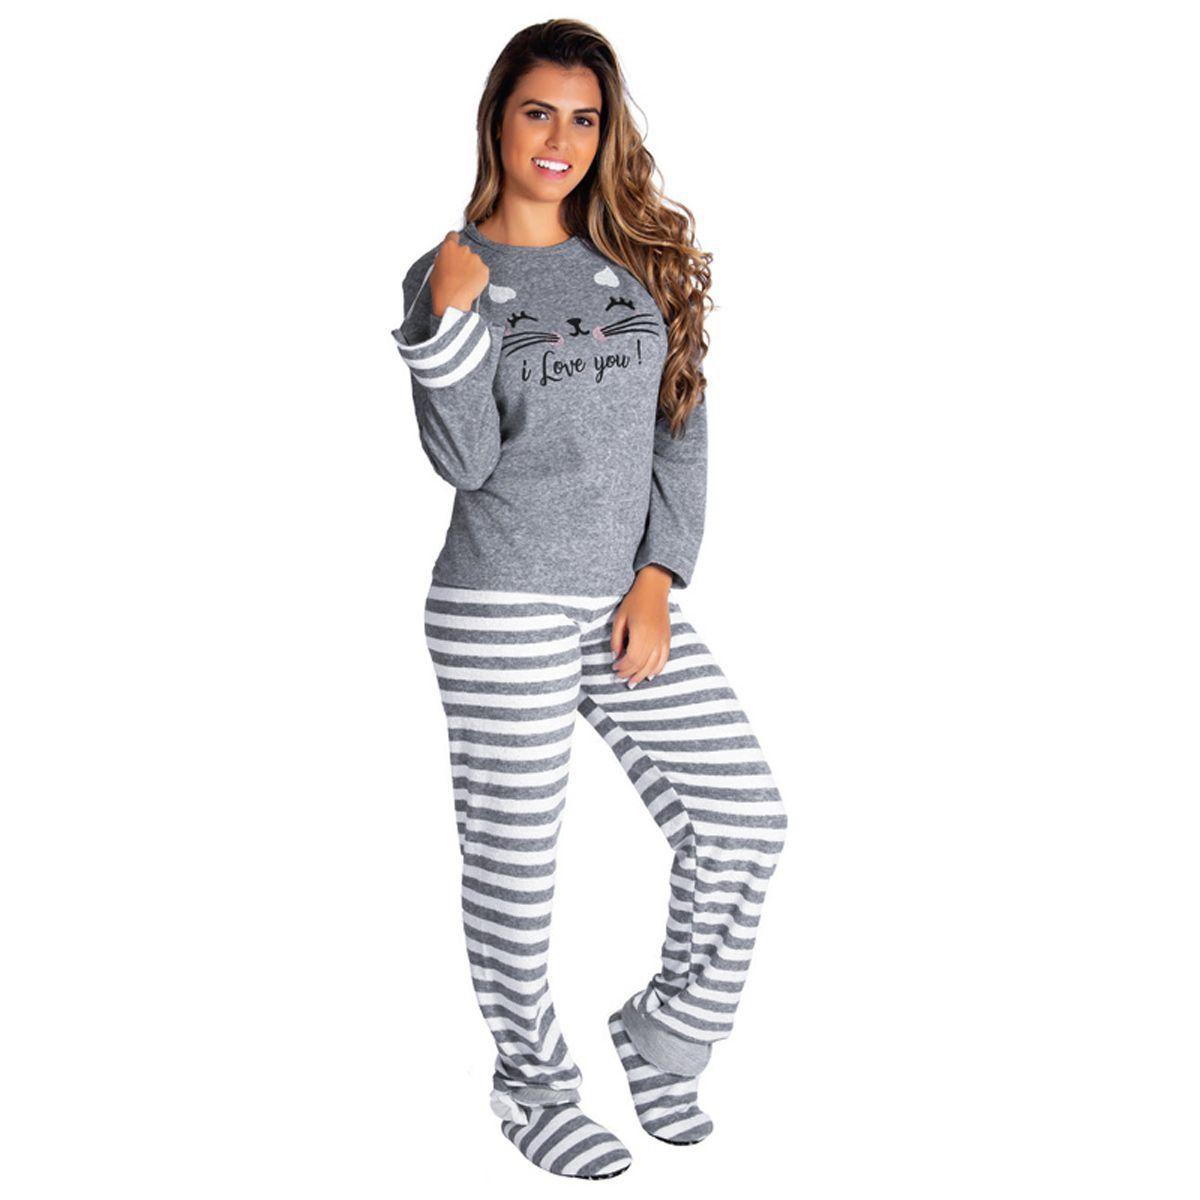 Pijama feminino estampado de inverno plush Victory